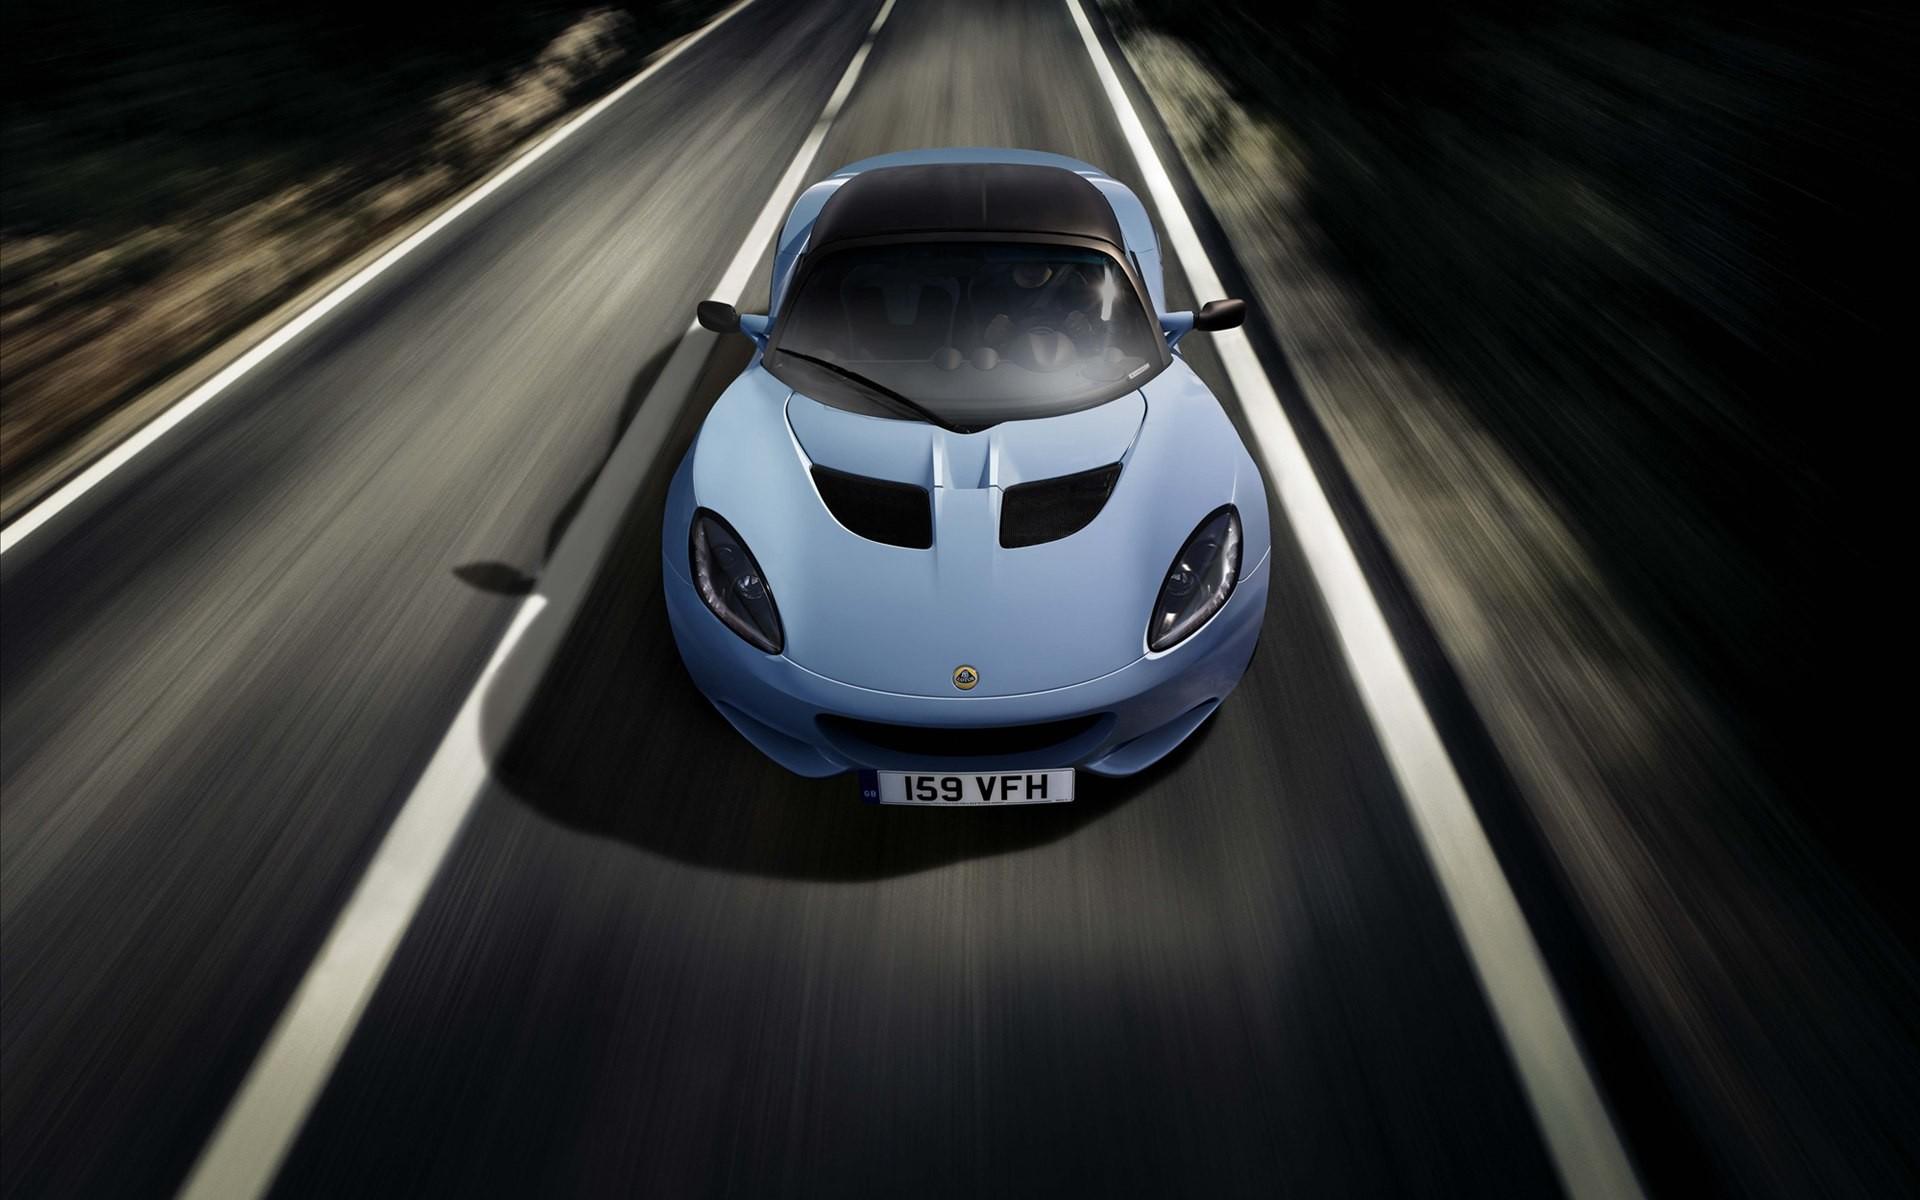 http://www.hdcarwallpapers.com/download/2012_lotus_elise_club_racer-1920x1200.jpg